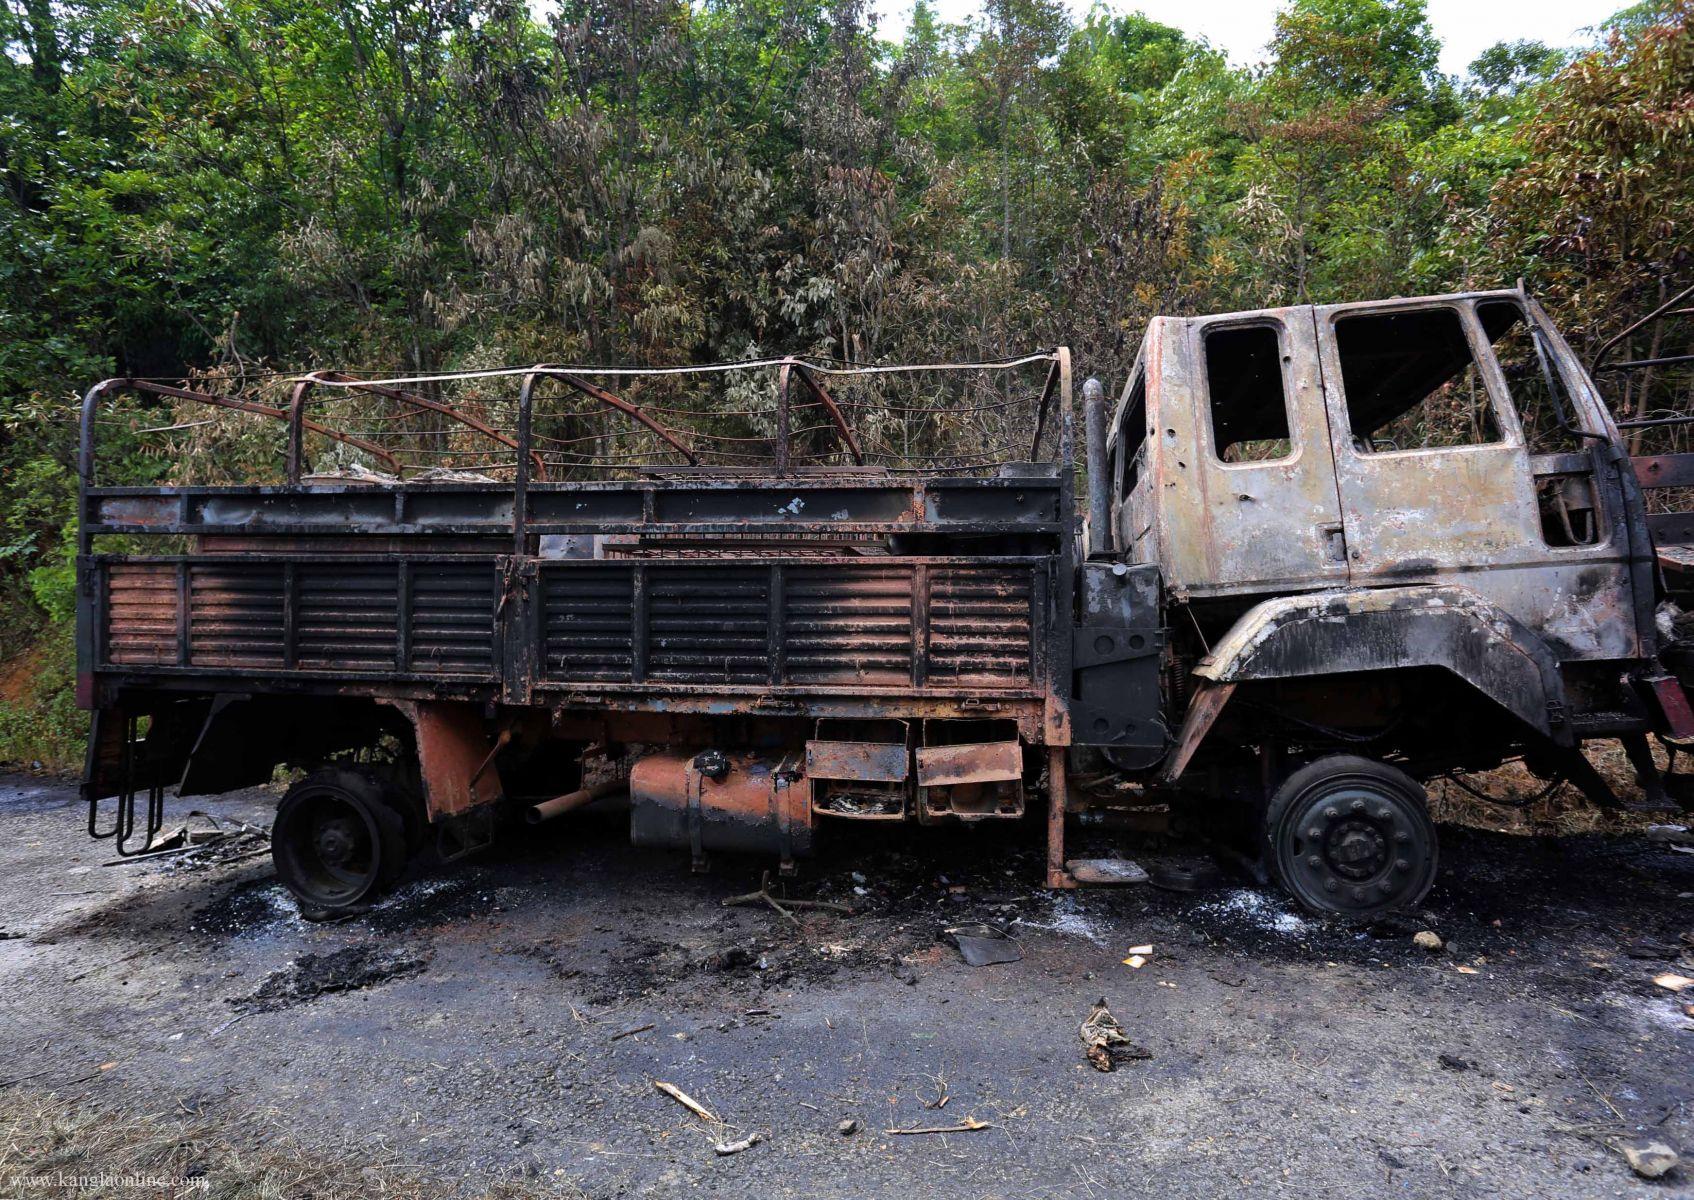 6th Dogra Regiment's truck ambushed by militants at Paraolon, Chandel District, Manipur.  Photo by Deepak Shijagurumayum.